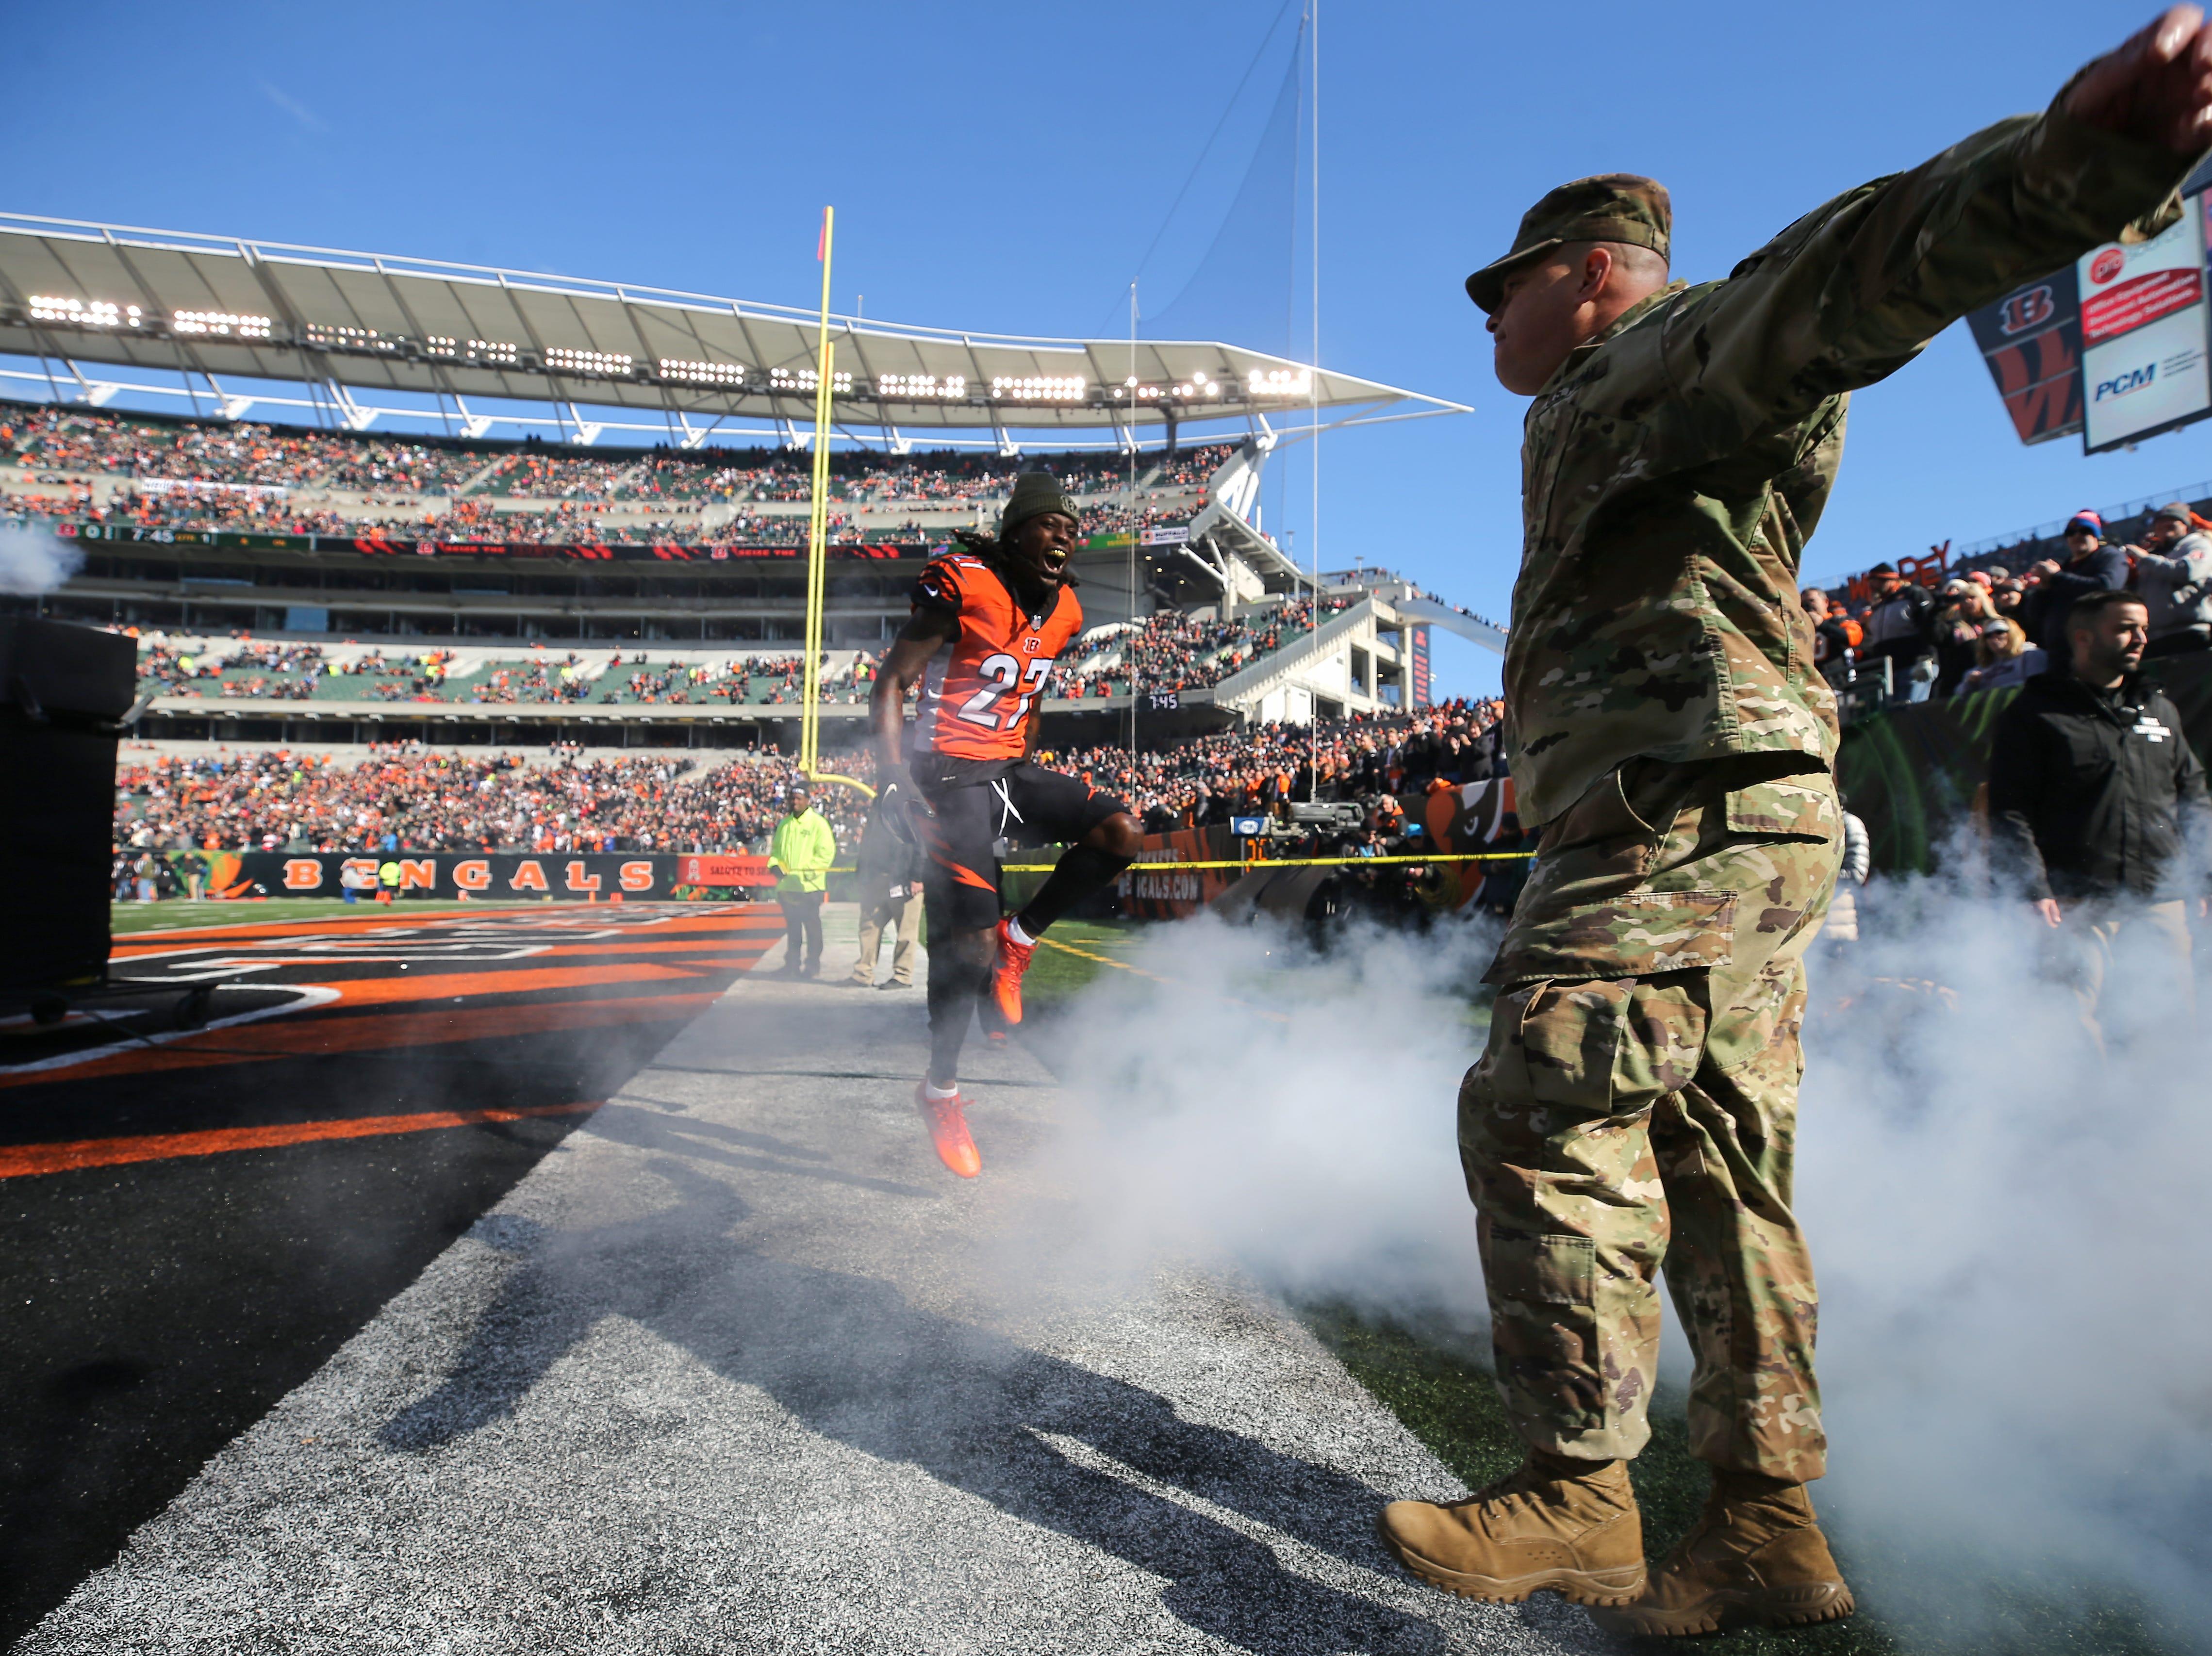 U.S. Army Major Jason Roberts, right , is introduced with Cincinnati Bengals cornerback Dre Kirkpatrick (27) before the Week 10 NFL game between the New Orleans Saints and the Cincinnati Bengals, Sunday, Nov. 11, 2018, at Paul Brown Stadium in Cincinnati.